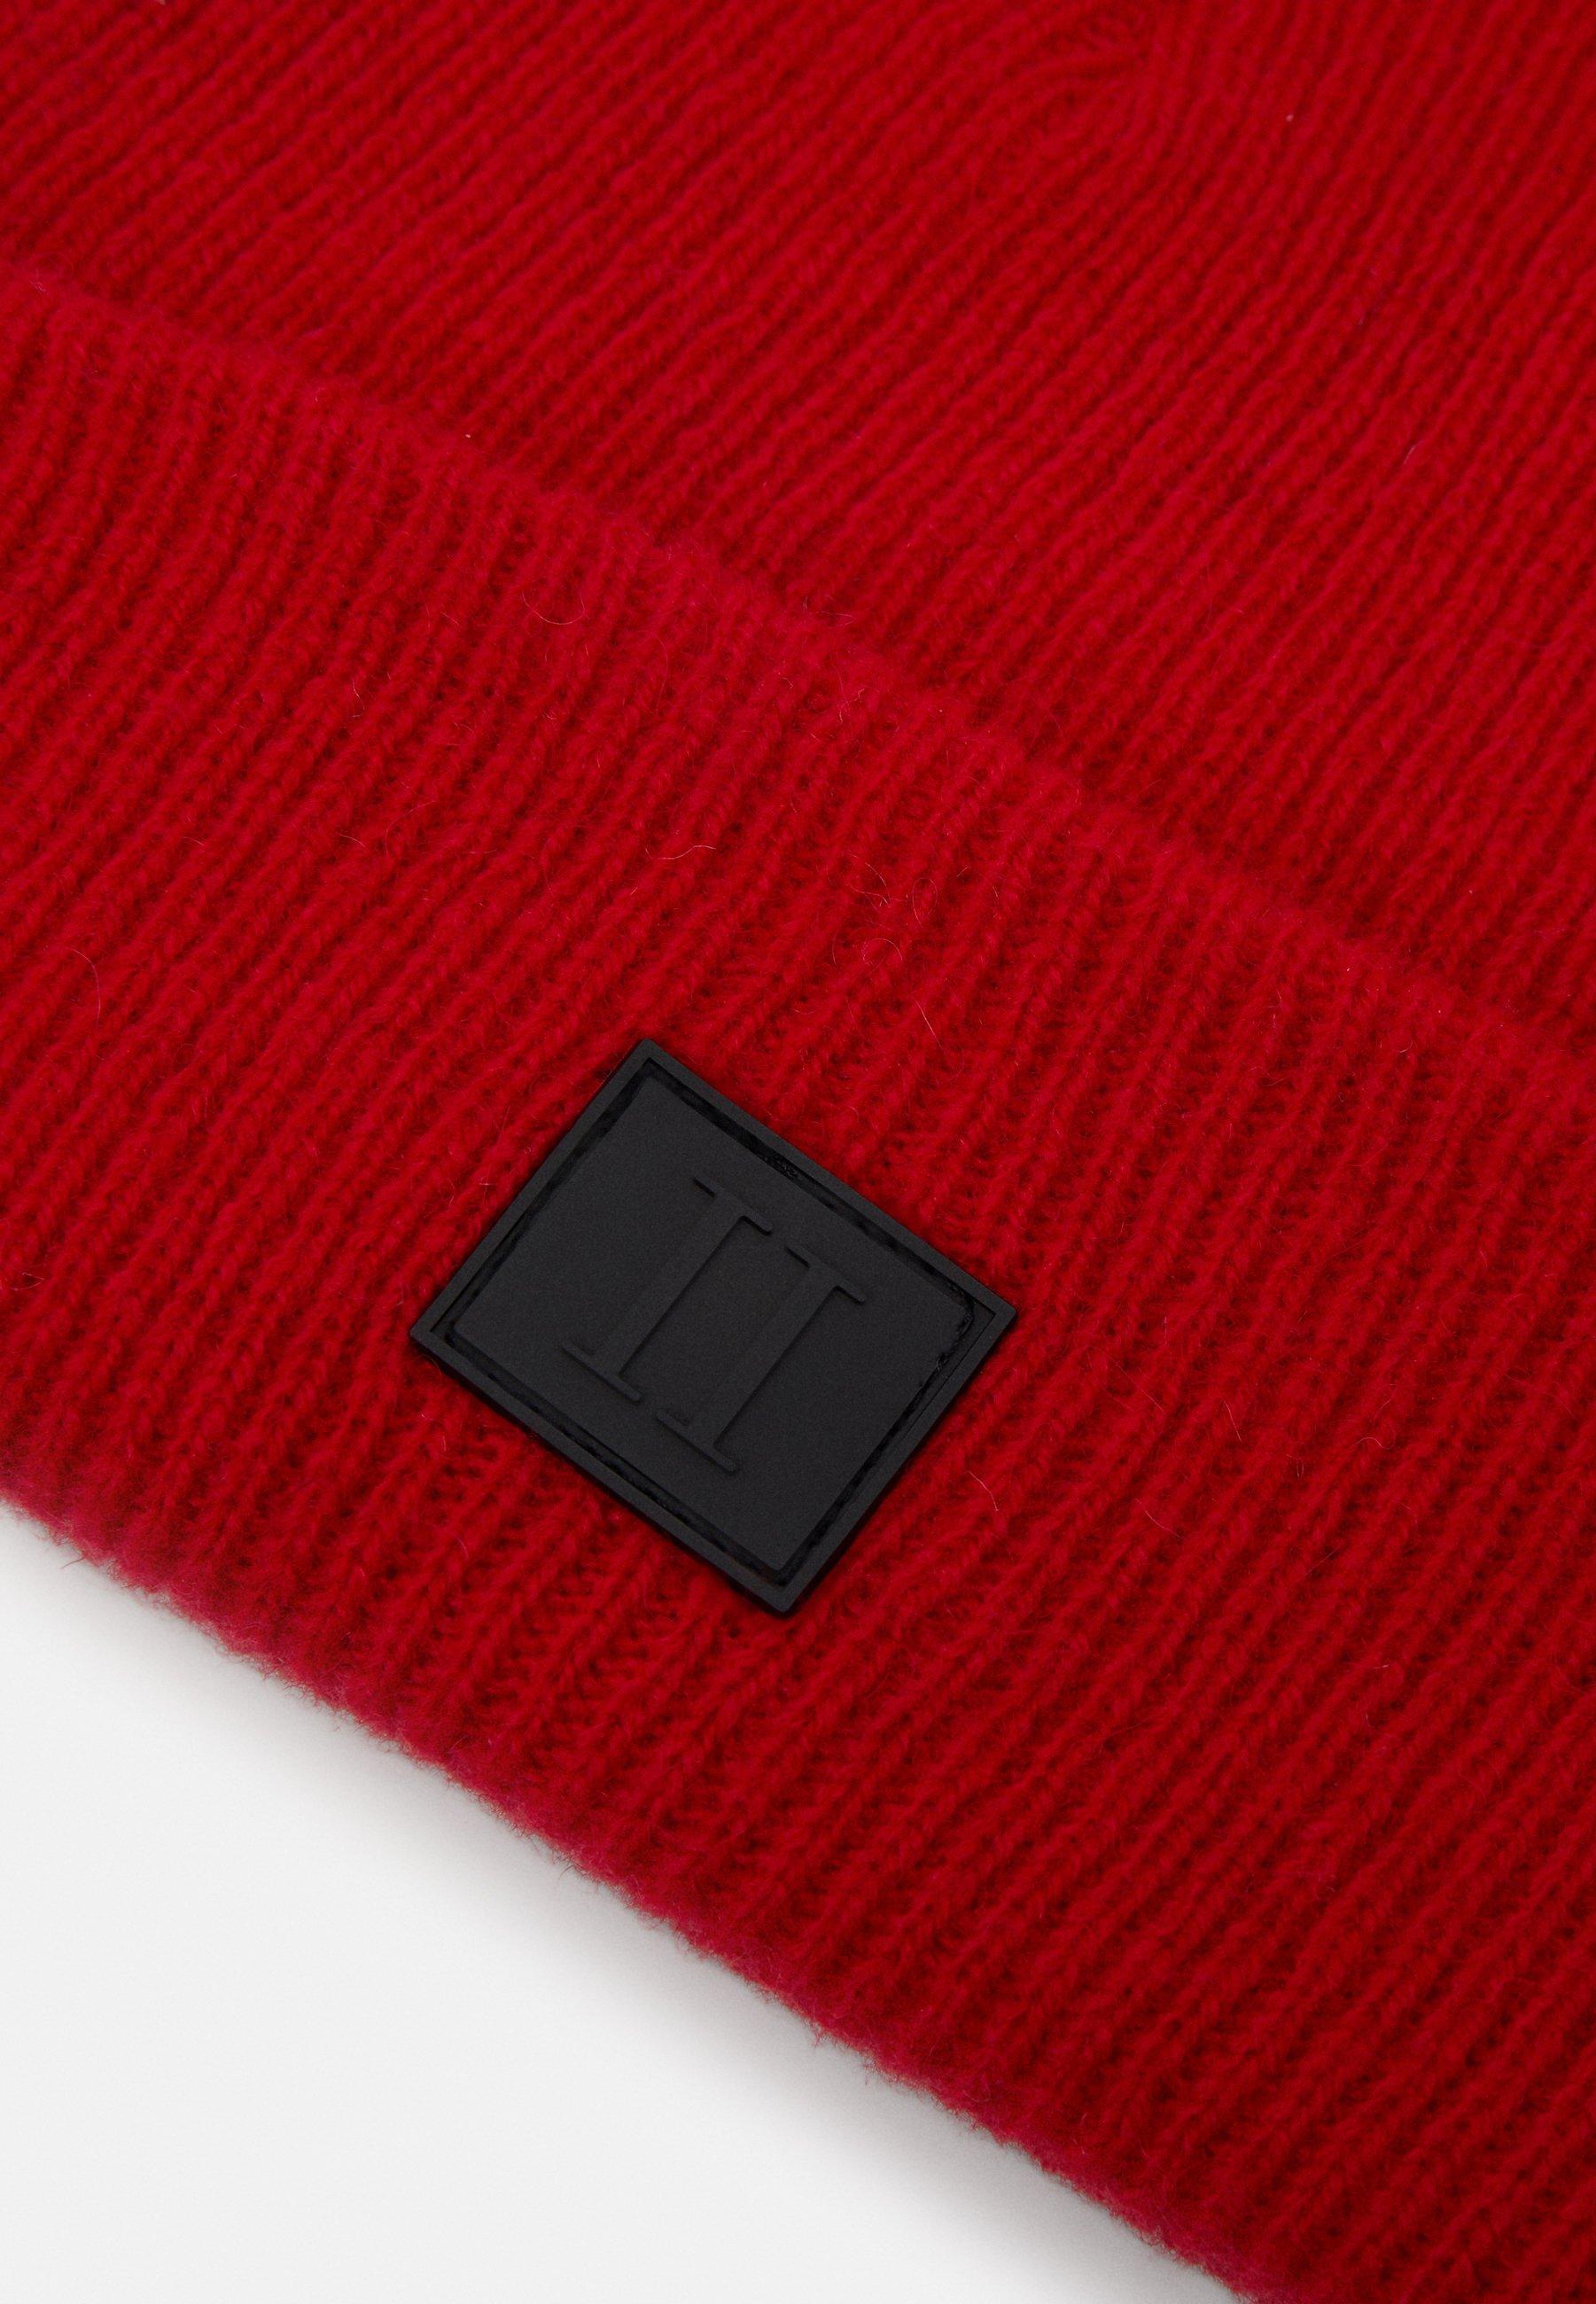 Les Deux BEANIE - Lue - red/rød 1RQV76x4zzgmTKo